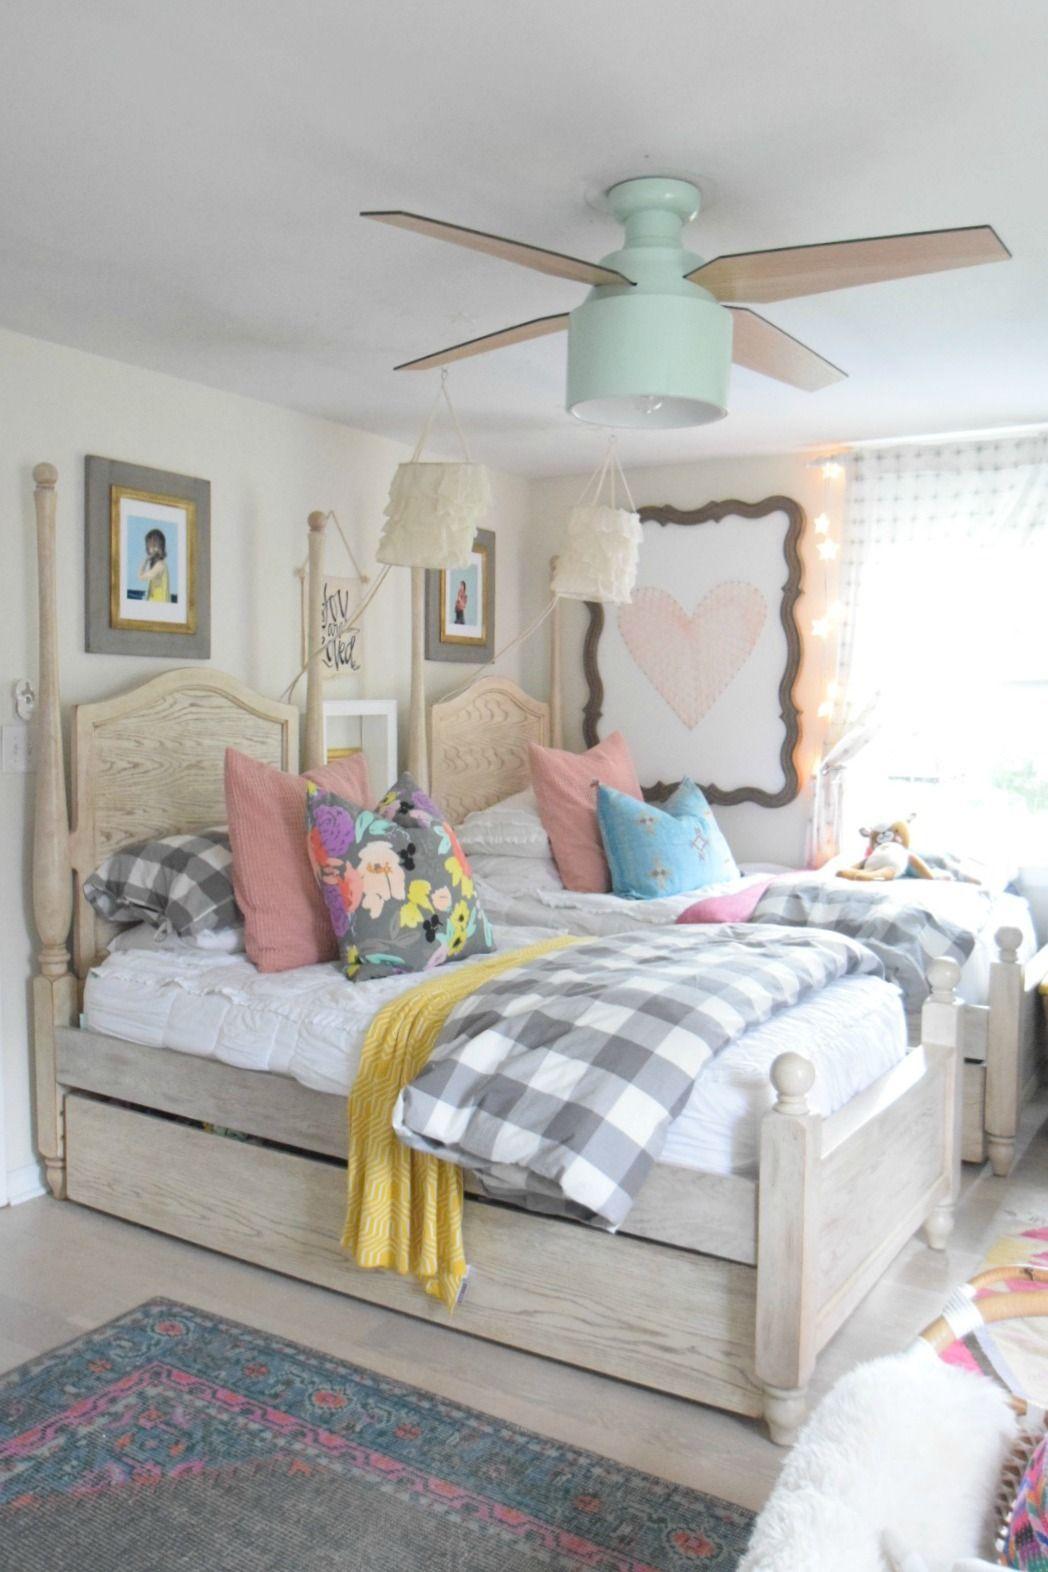 Tween Designed Bedroom Modern And Stylish Ceiling Fans Bedroom Ceiling Fan Update Ceiling Fan Bedroom Romantic Bedroom Decor Bedroom Design